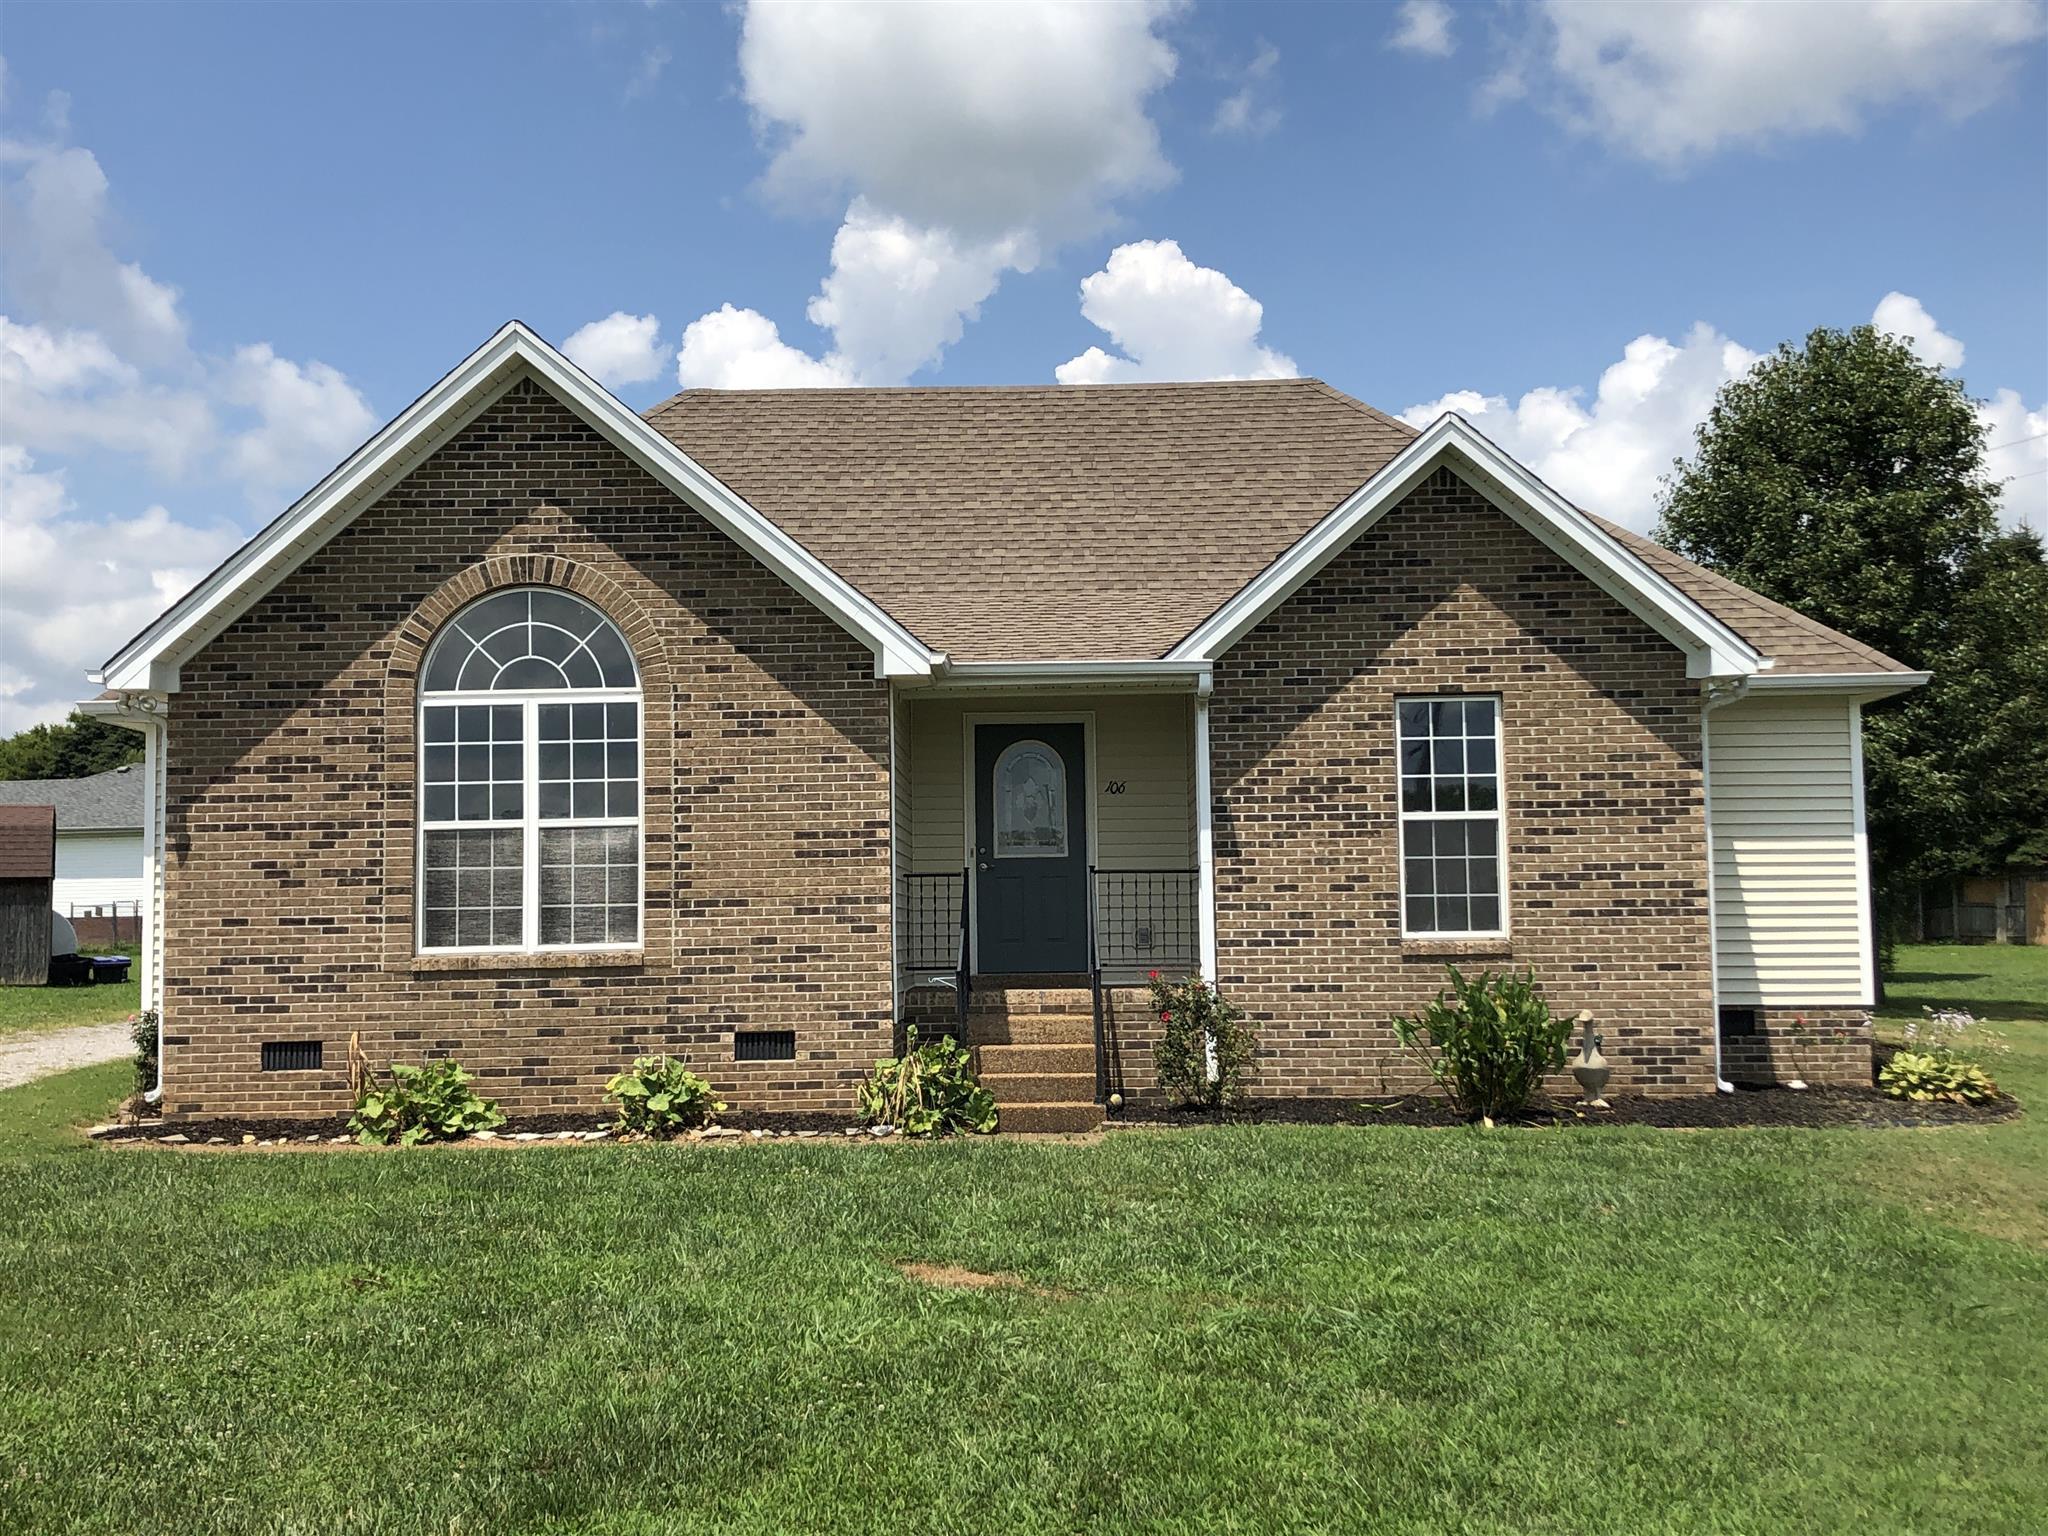 106 Blakes Ct, Portland, TN 37148 - Portland, TN real estate listing